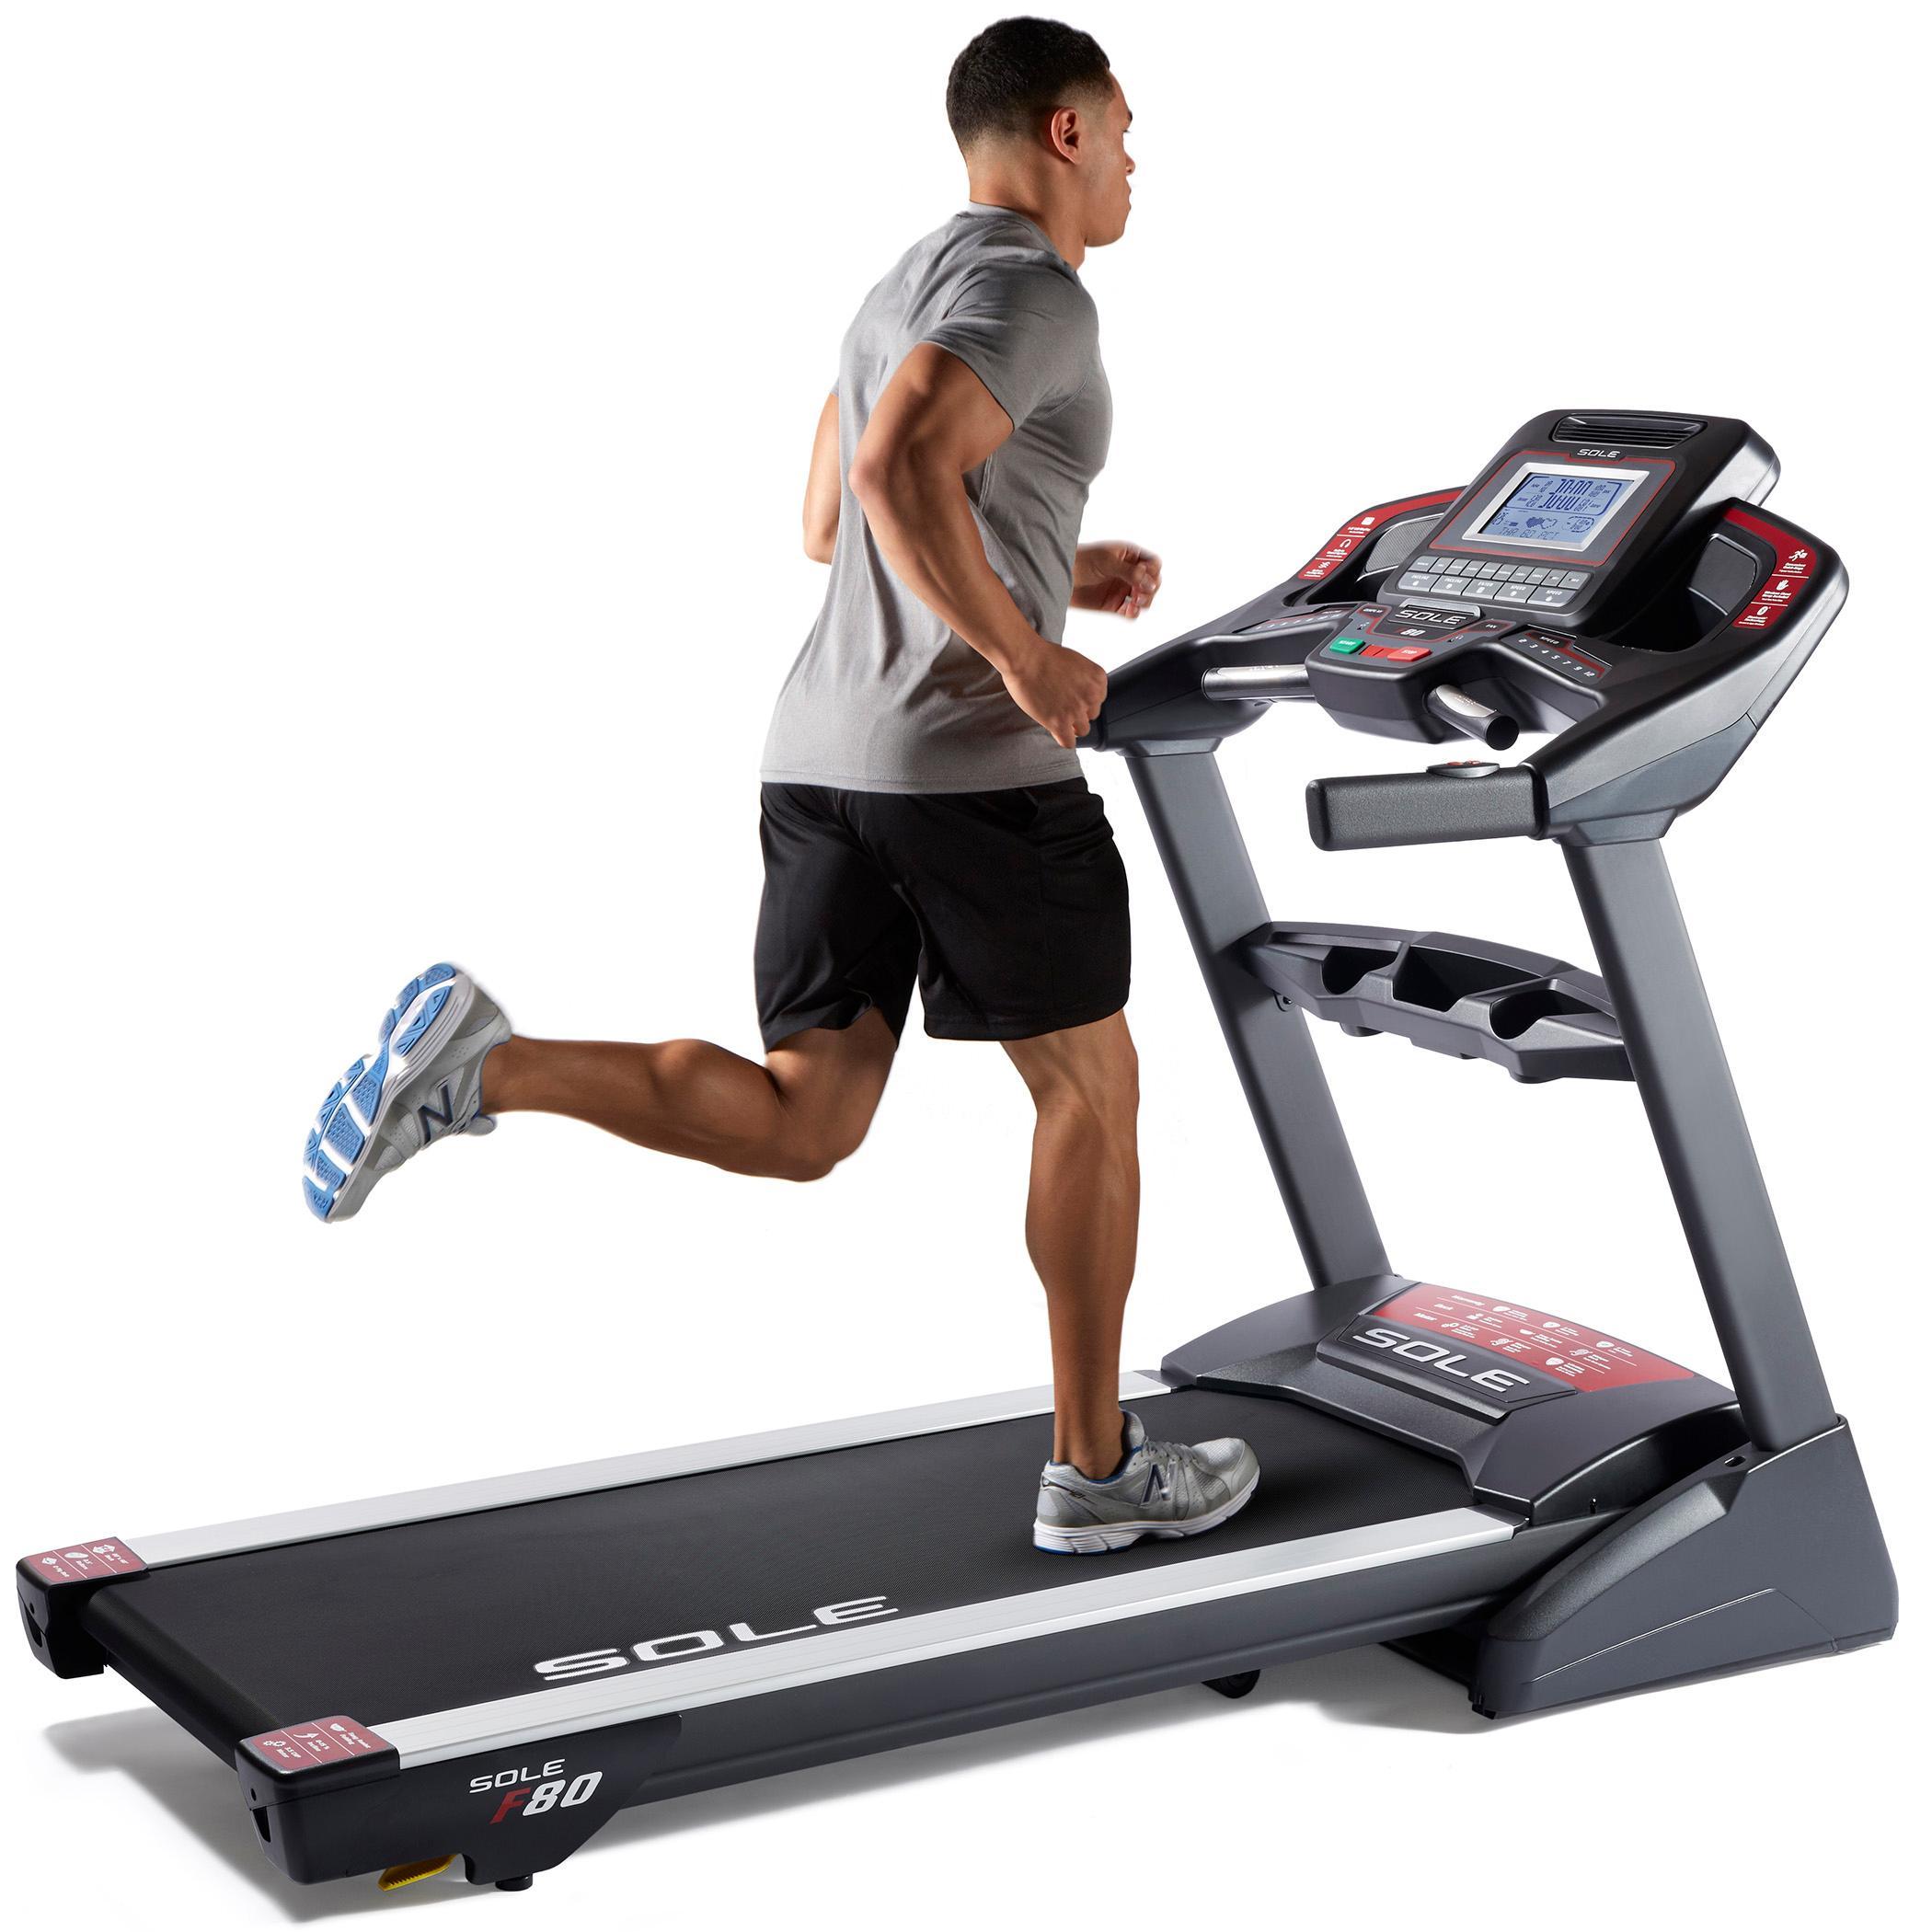 Fitness Equipment Maintenance Near Me: SOLE Fitness F80 Folding Treadmill Machine, 3.5 CHP Motor